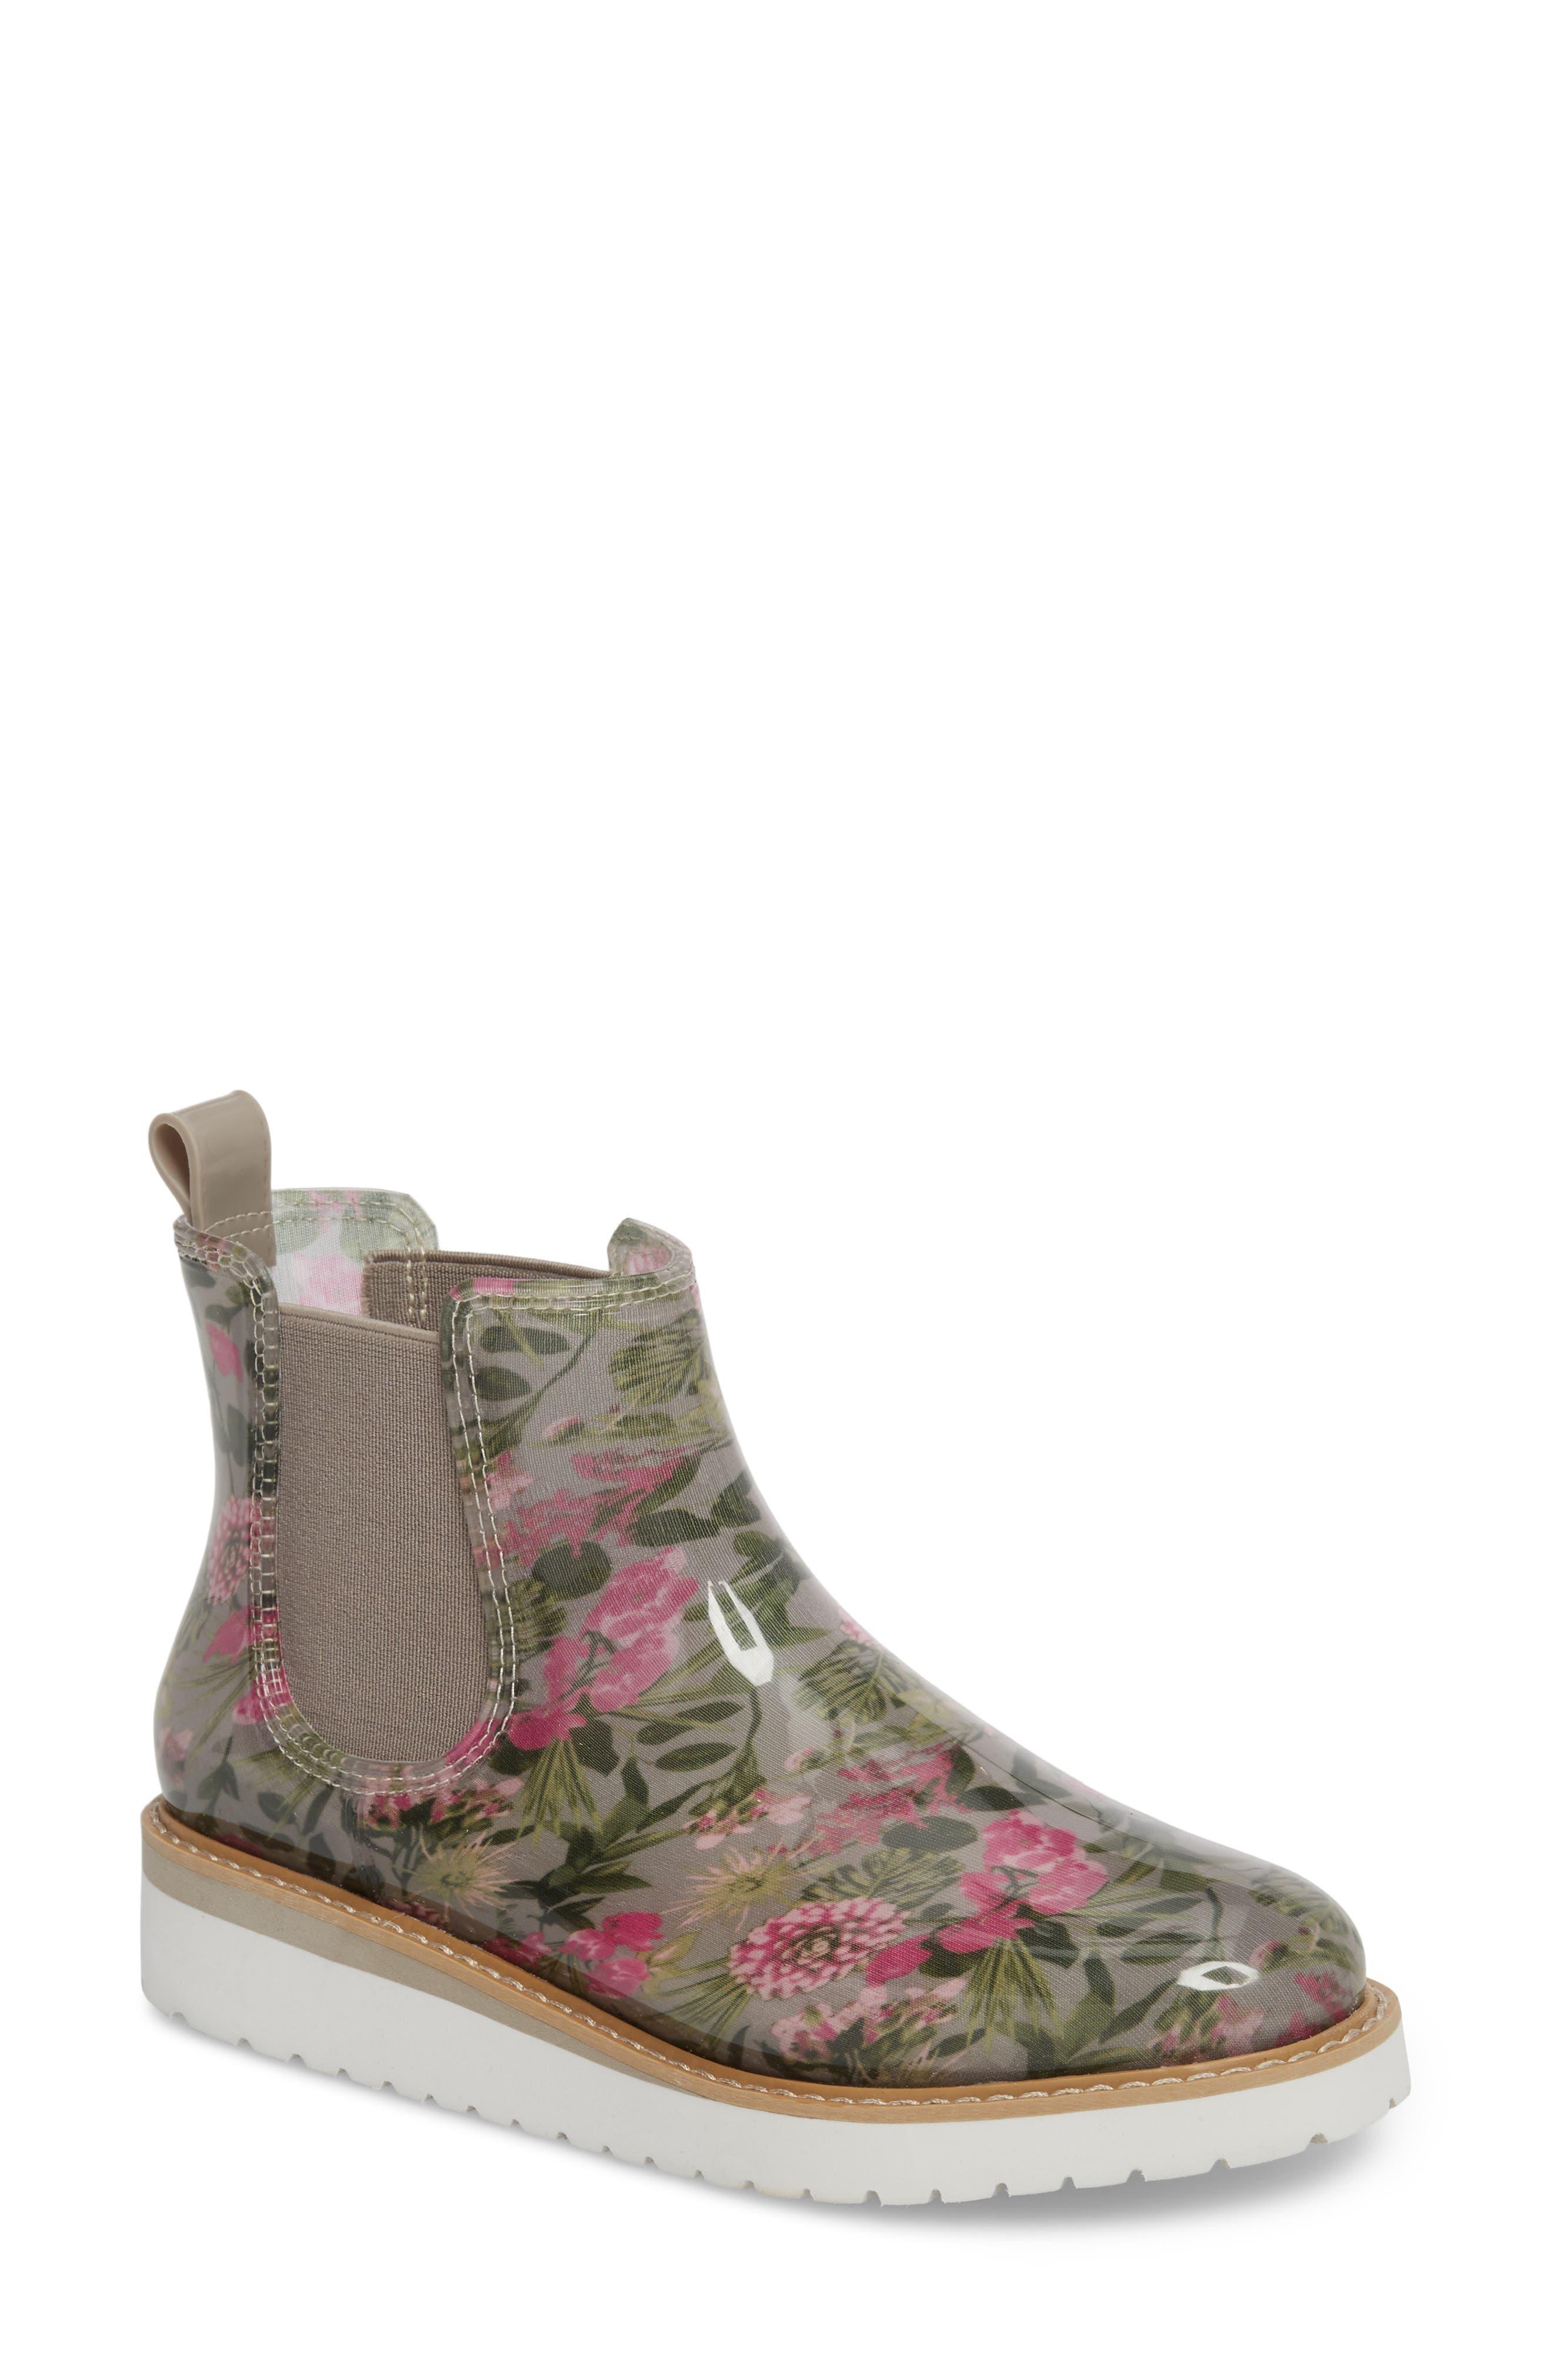 Kensington Chelsea Rain Boot,                         Main,                         color, Tropical Floral